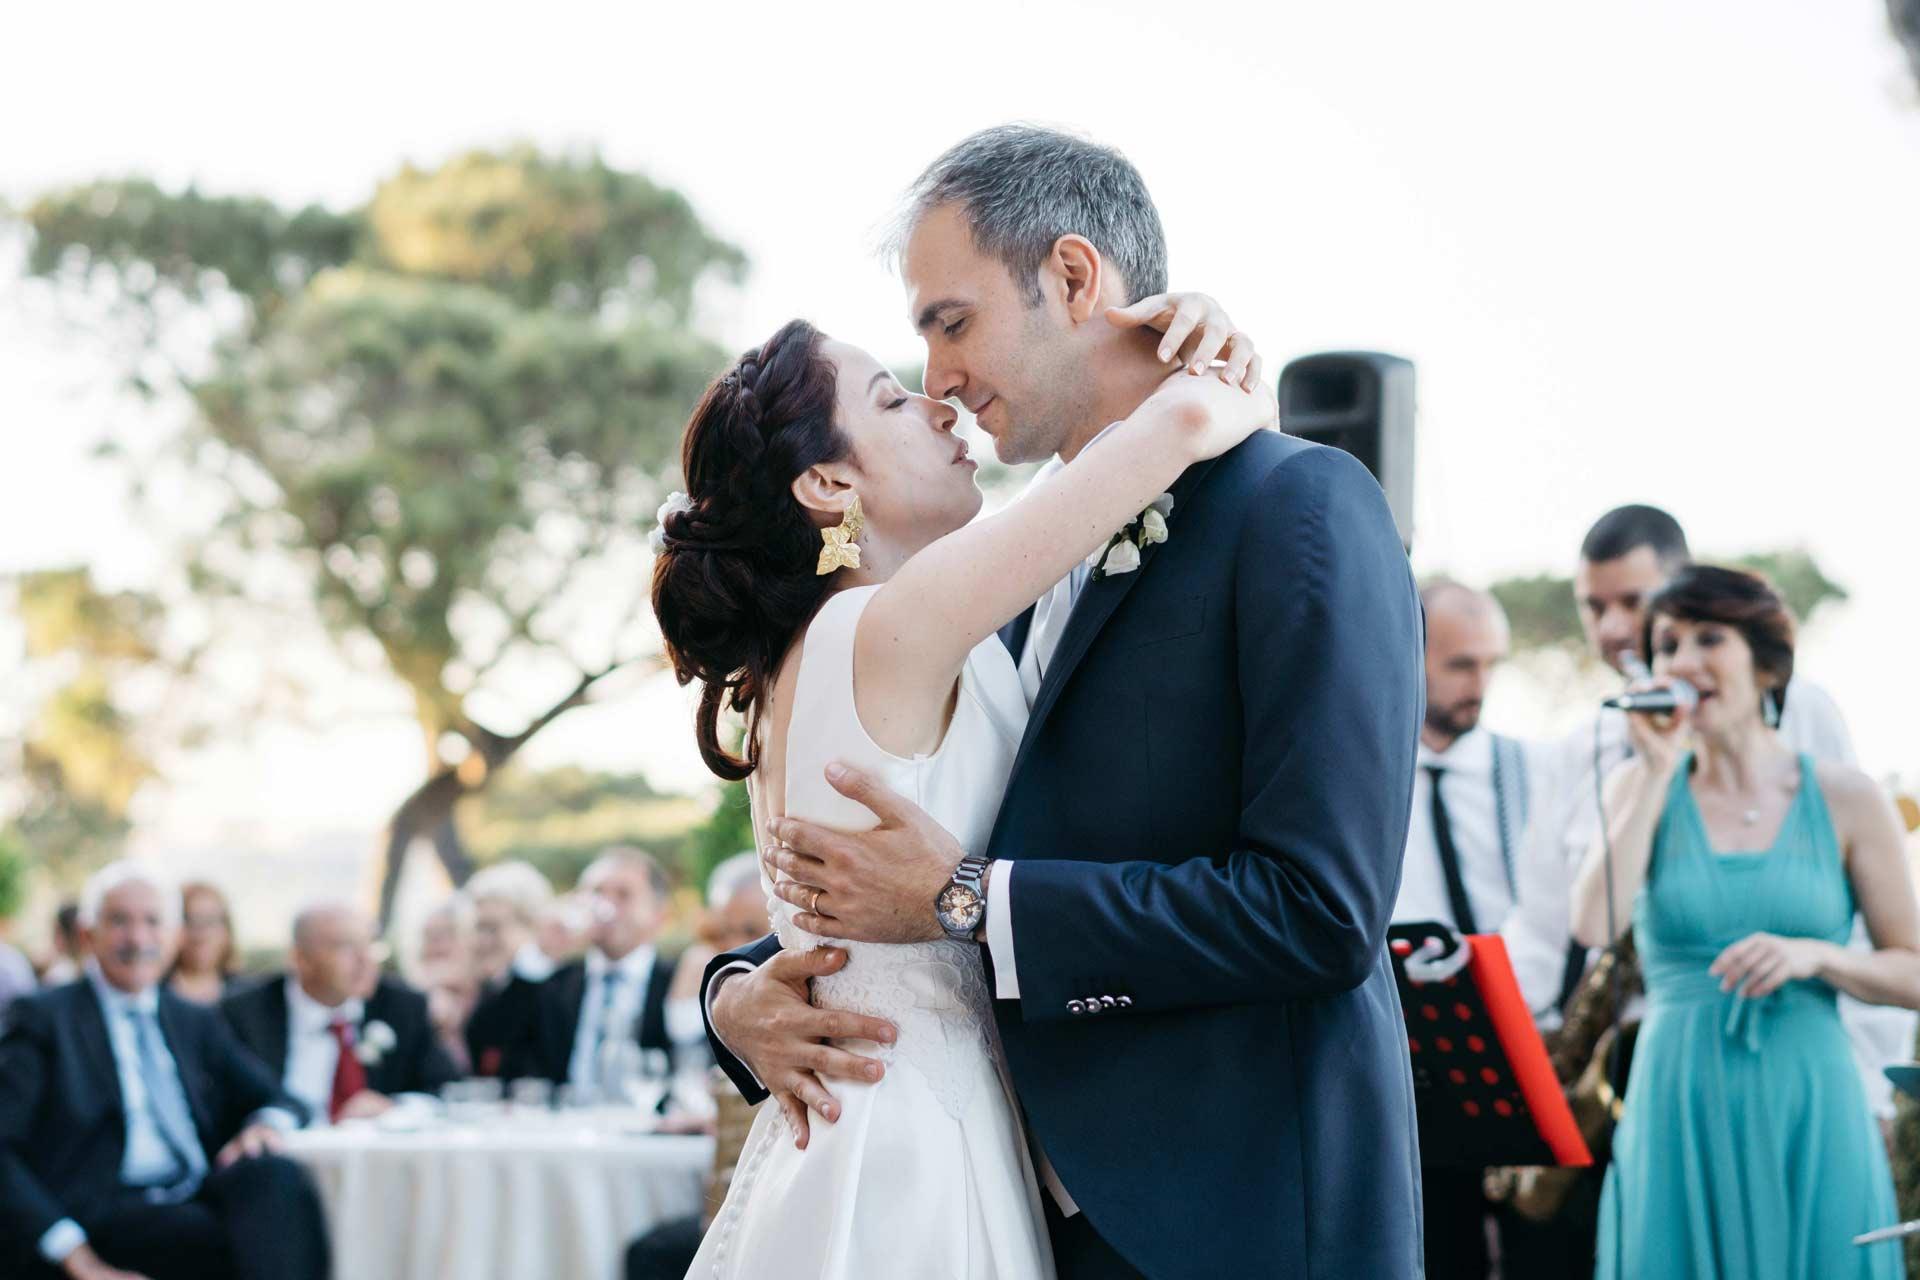 foto-matrimonio-roma-8-C&M-simone-nunzi